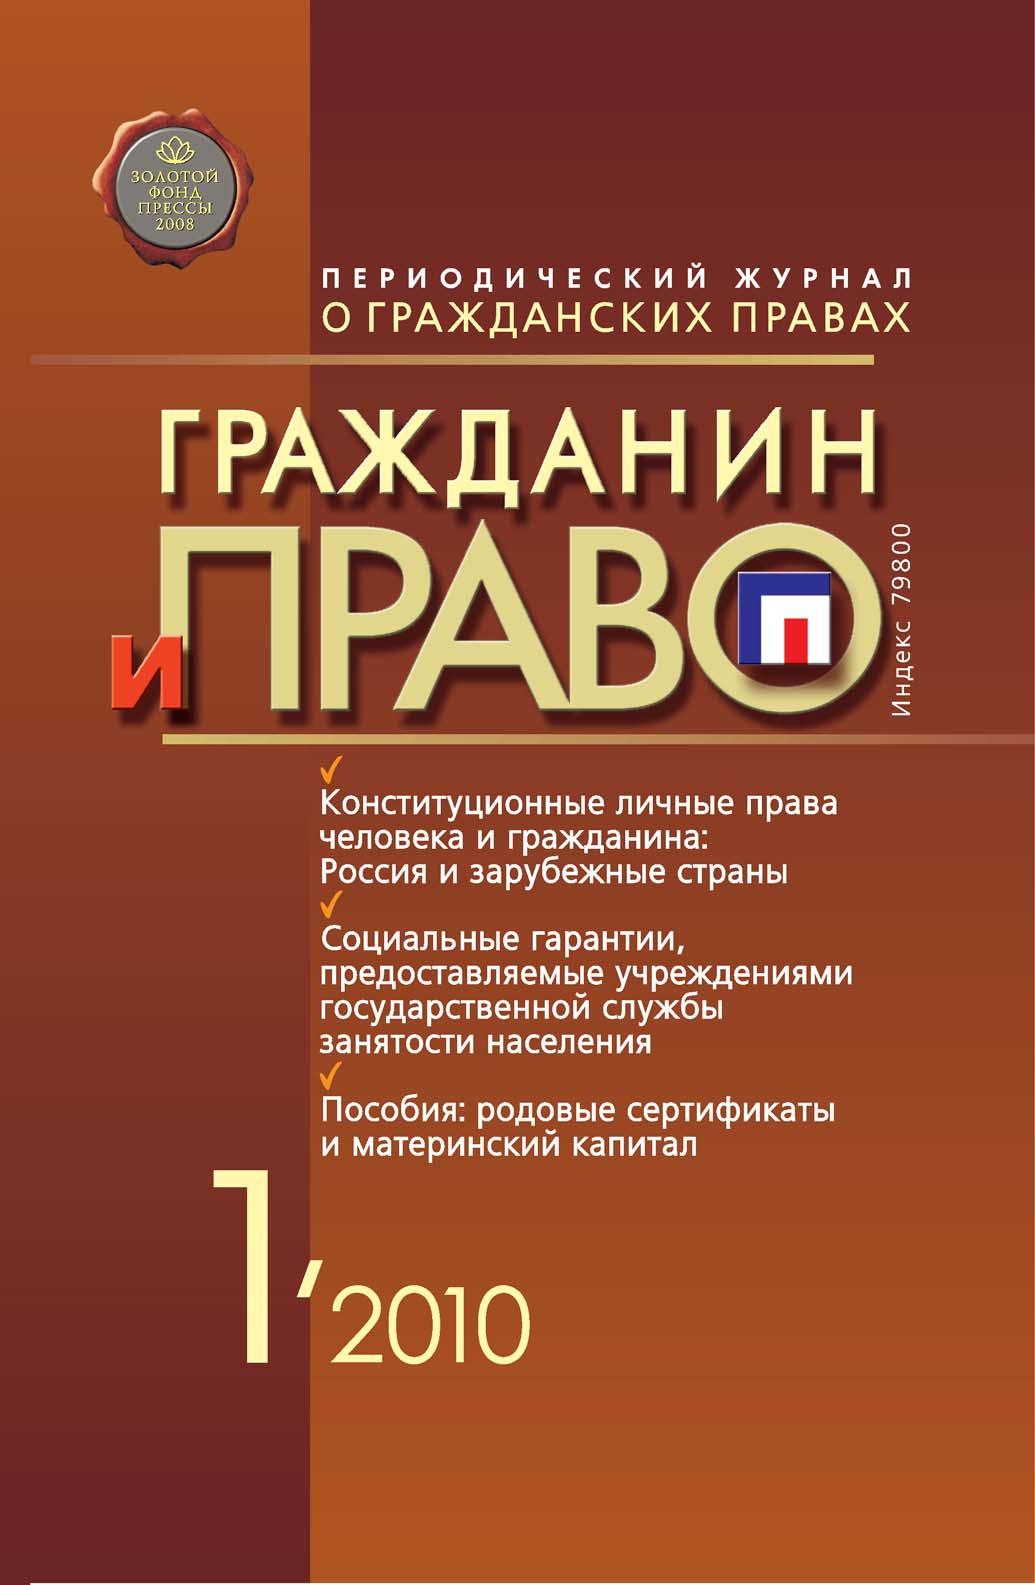 Гражданин и право №01/2010